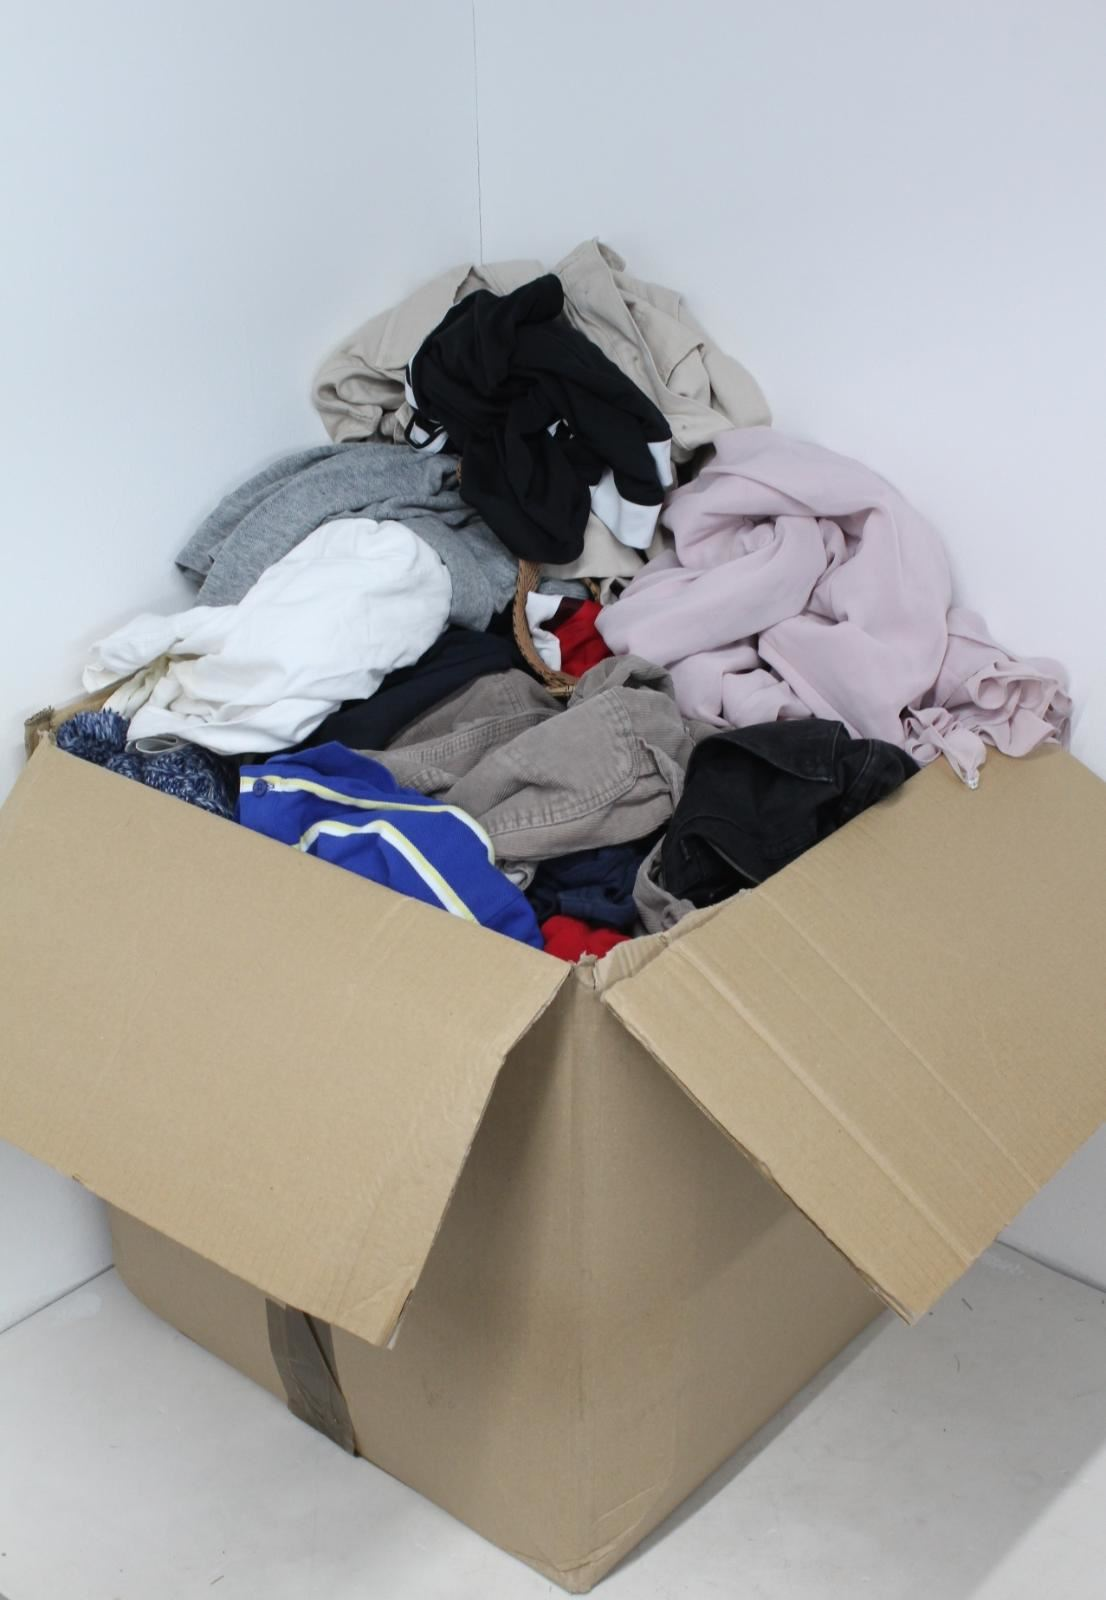 JOB-LOT-Men-039-s-Womens-Fashion-Clothing-20-034-x20-034-Box-Mixed-Type-amp-Size